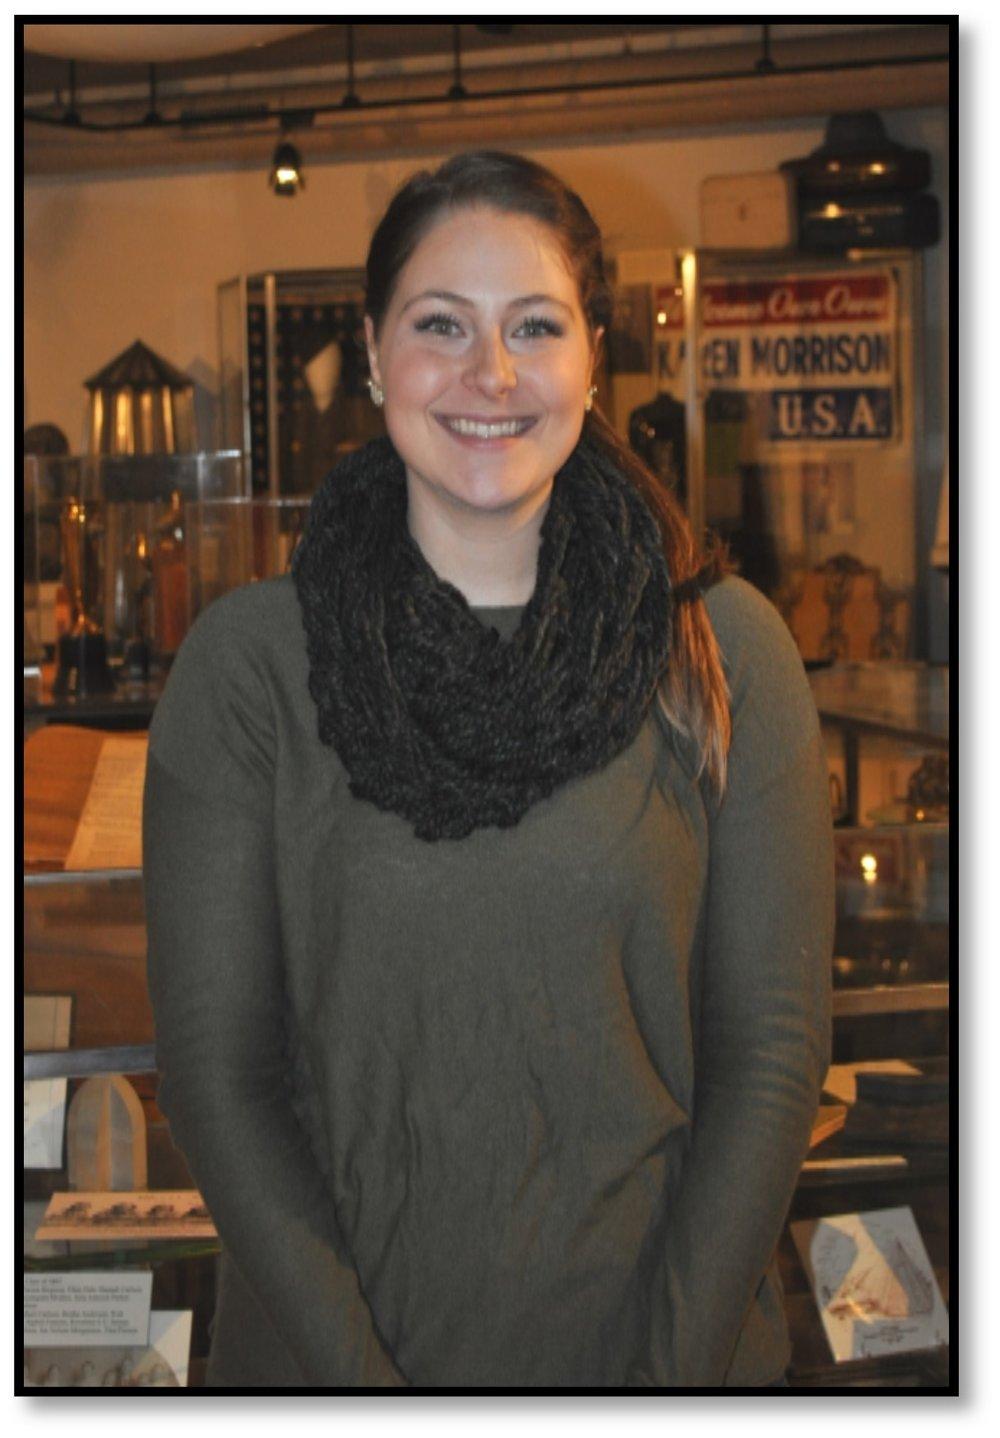 Carissa Bolvin- Intern & Museum Assistant 2015-2016